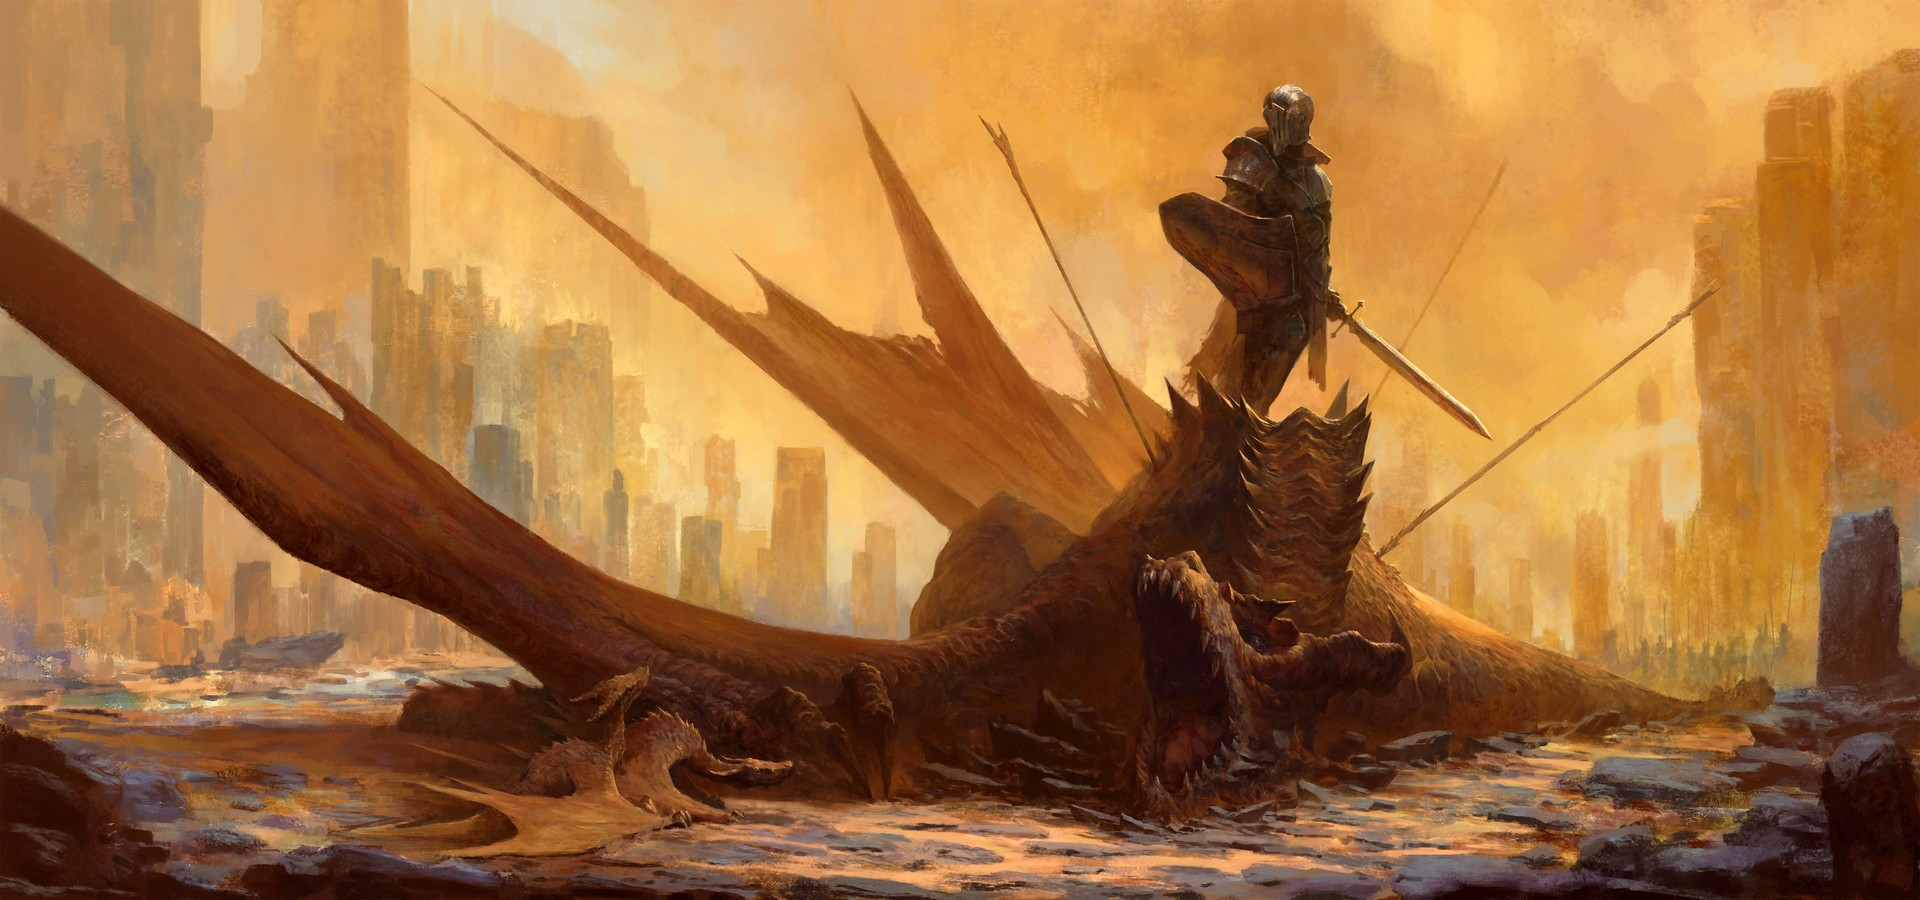 General 1920x900 Taras Susak digital dragon creature fantasy art artwork knight warrior sword shield Armored